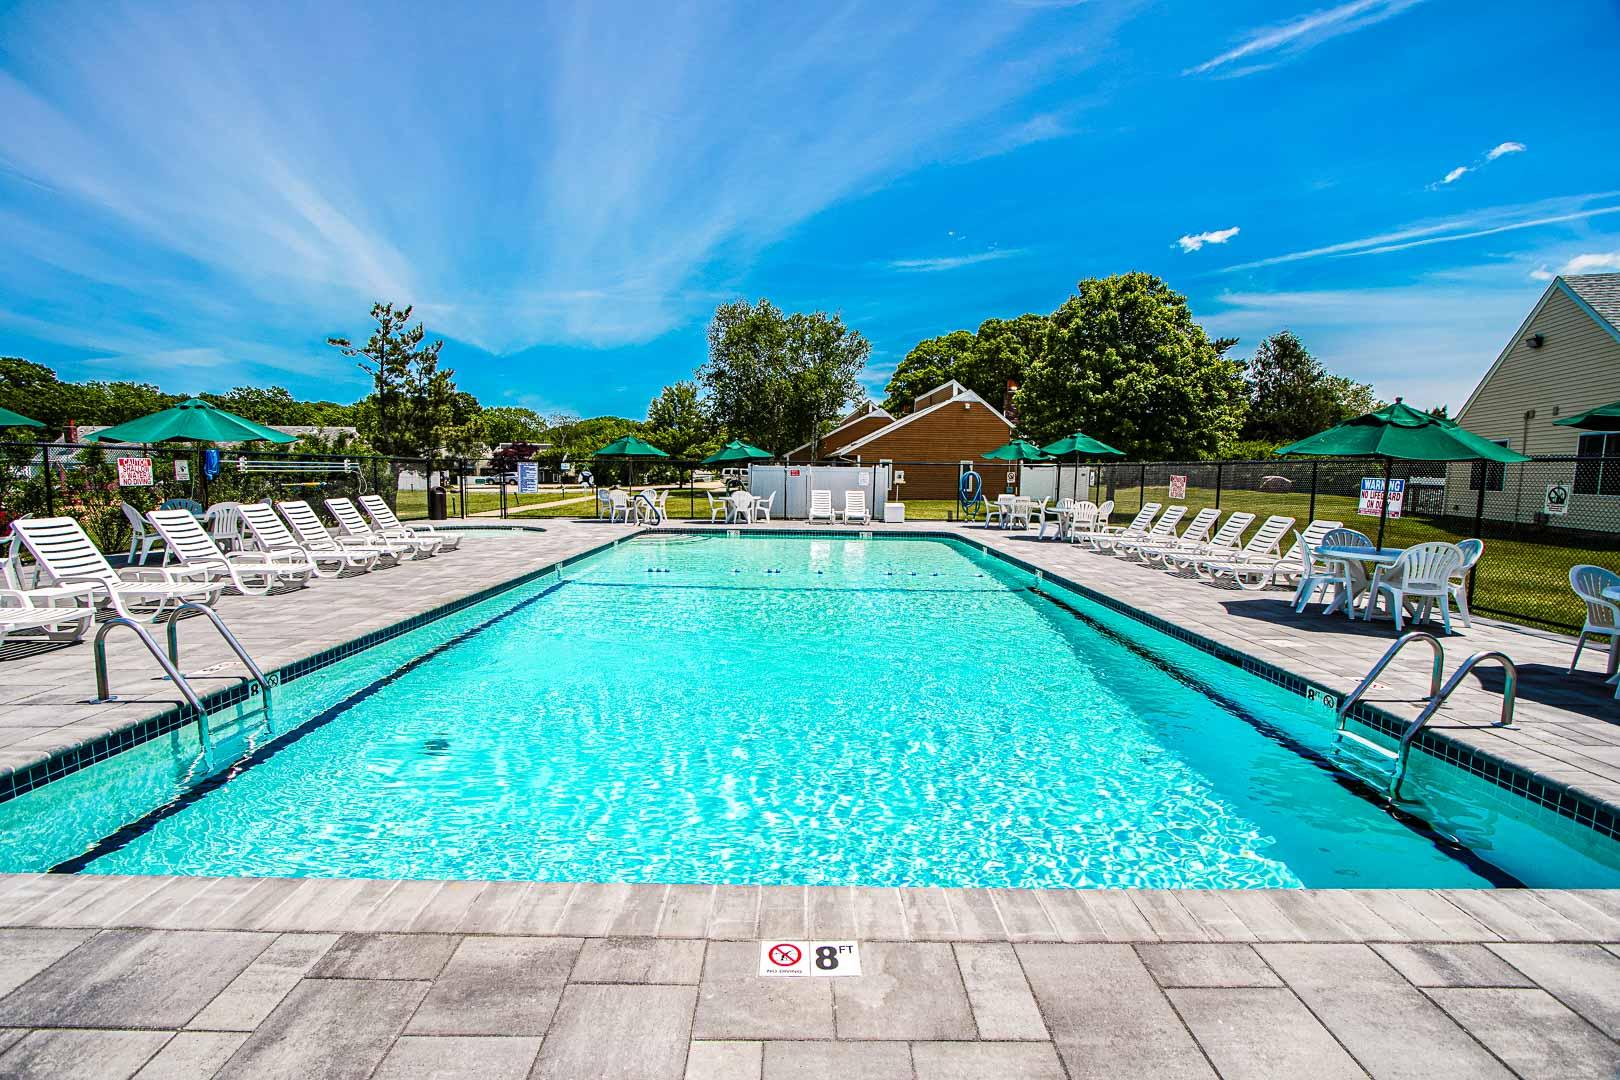 A crisp outdoor swimming pool at VRI's Brewster Green Resort in Massachusetts.